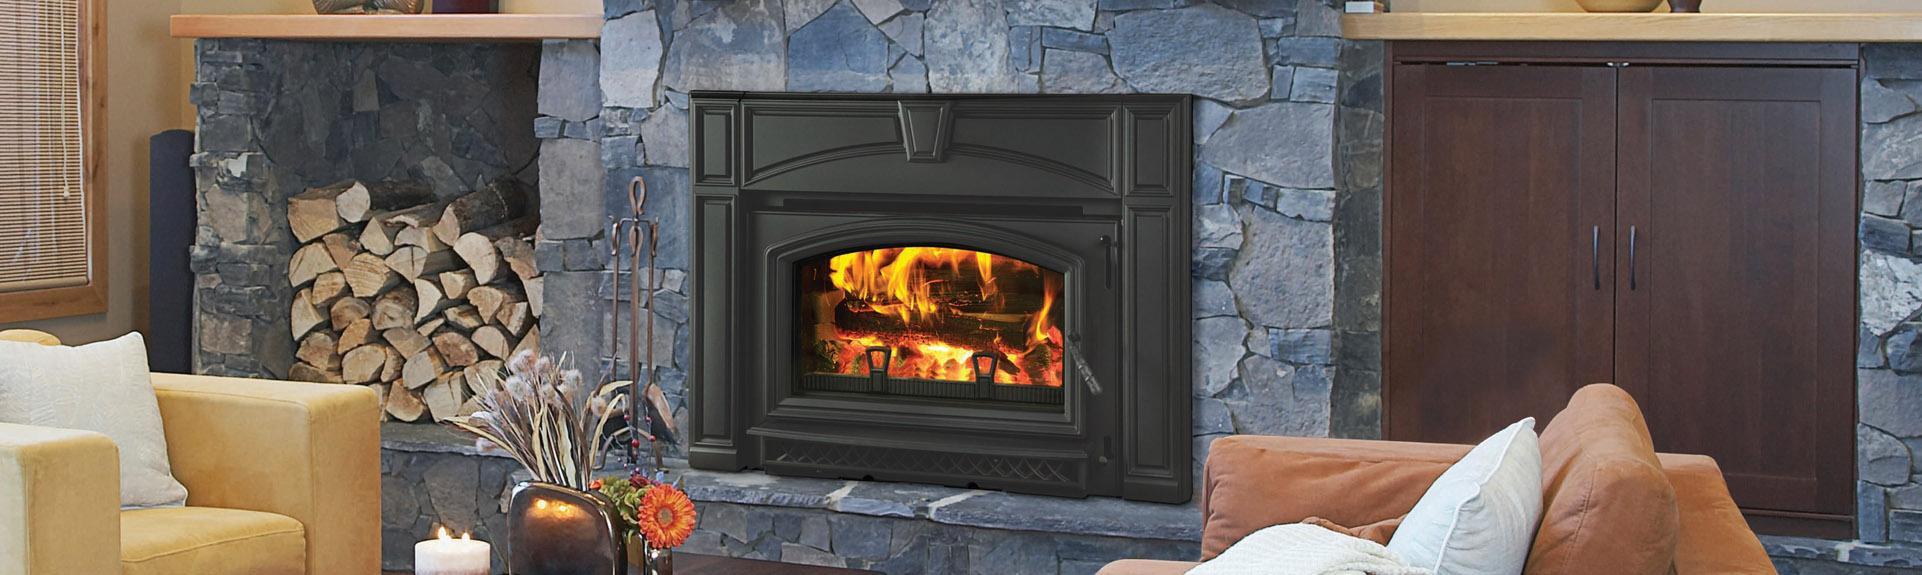 harman stoves wood stove u0026 fireplace center